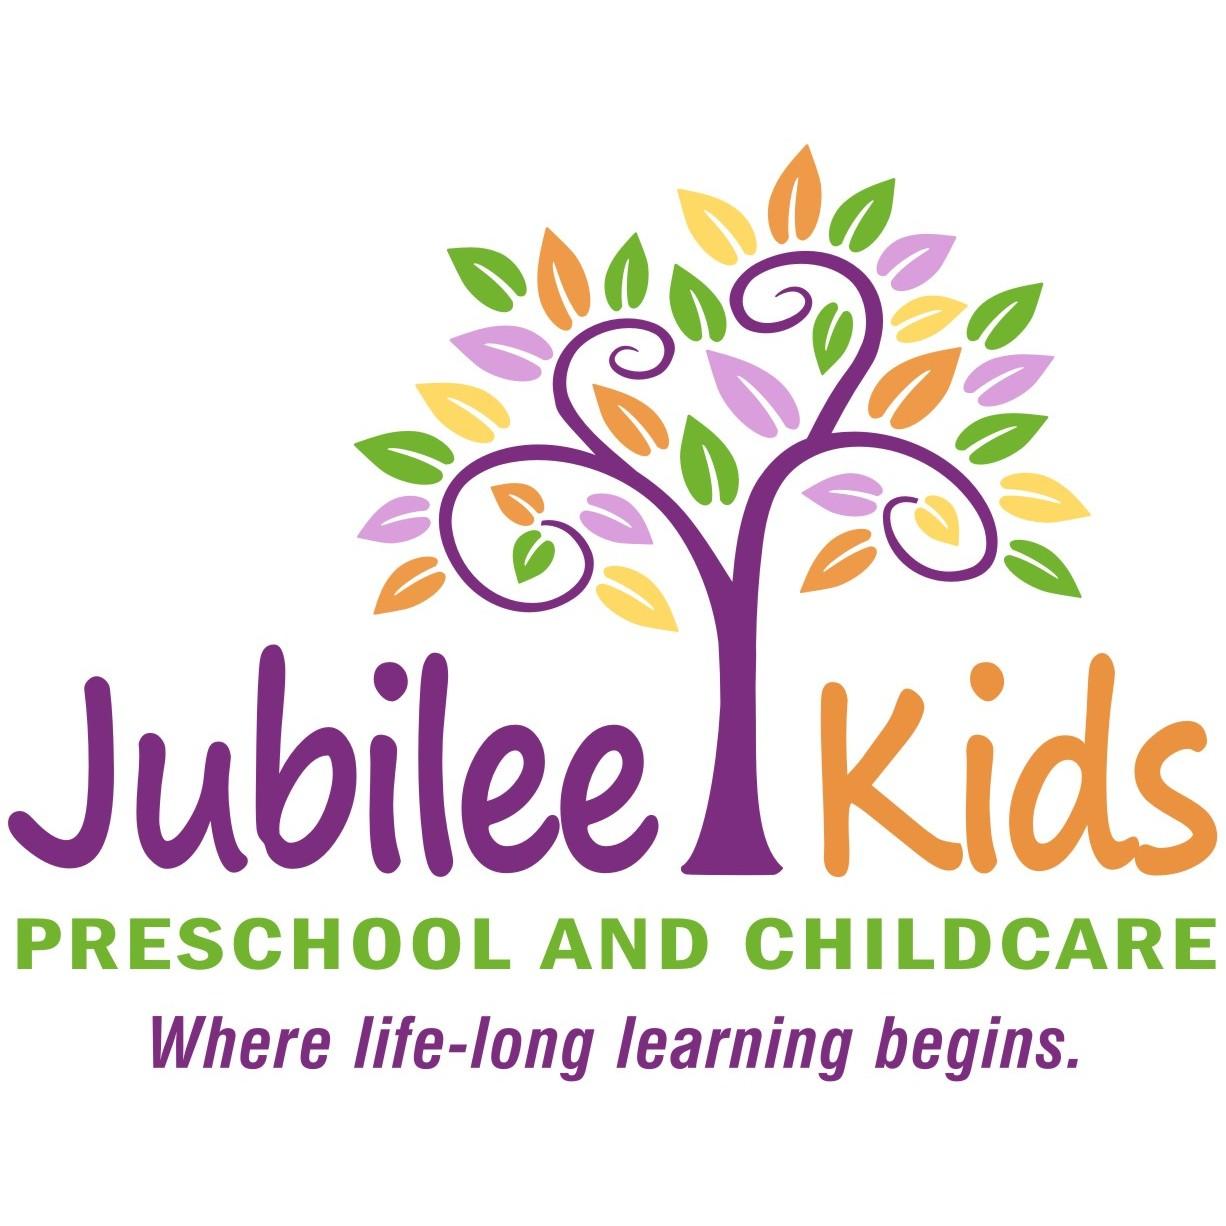 Jubilee Kids Preschool and Child Care